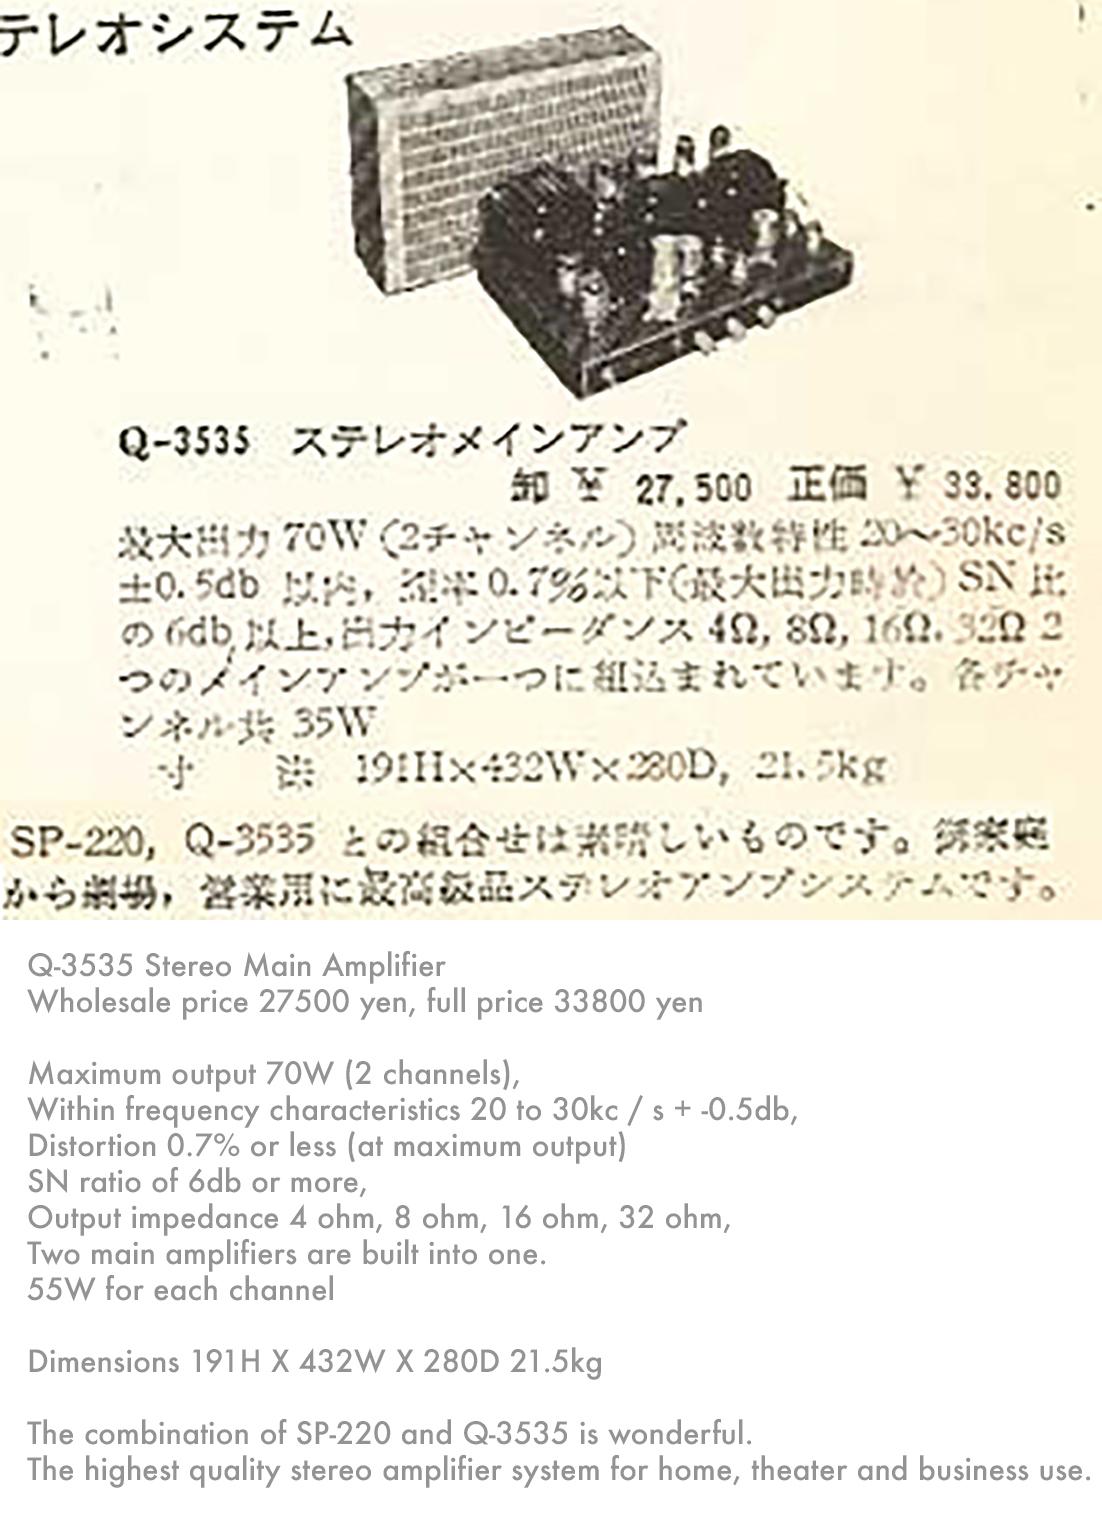 Q3535text